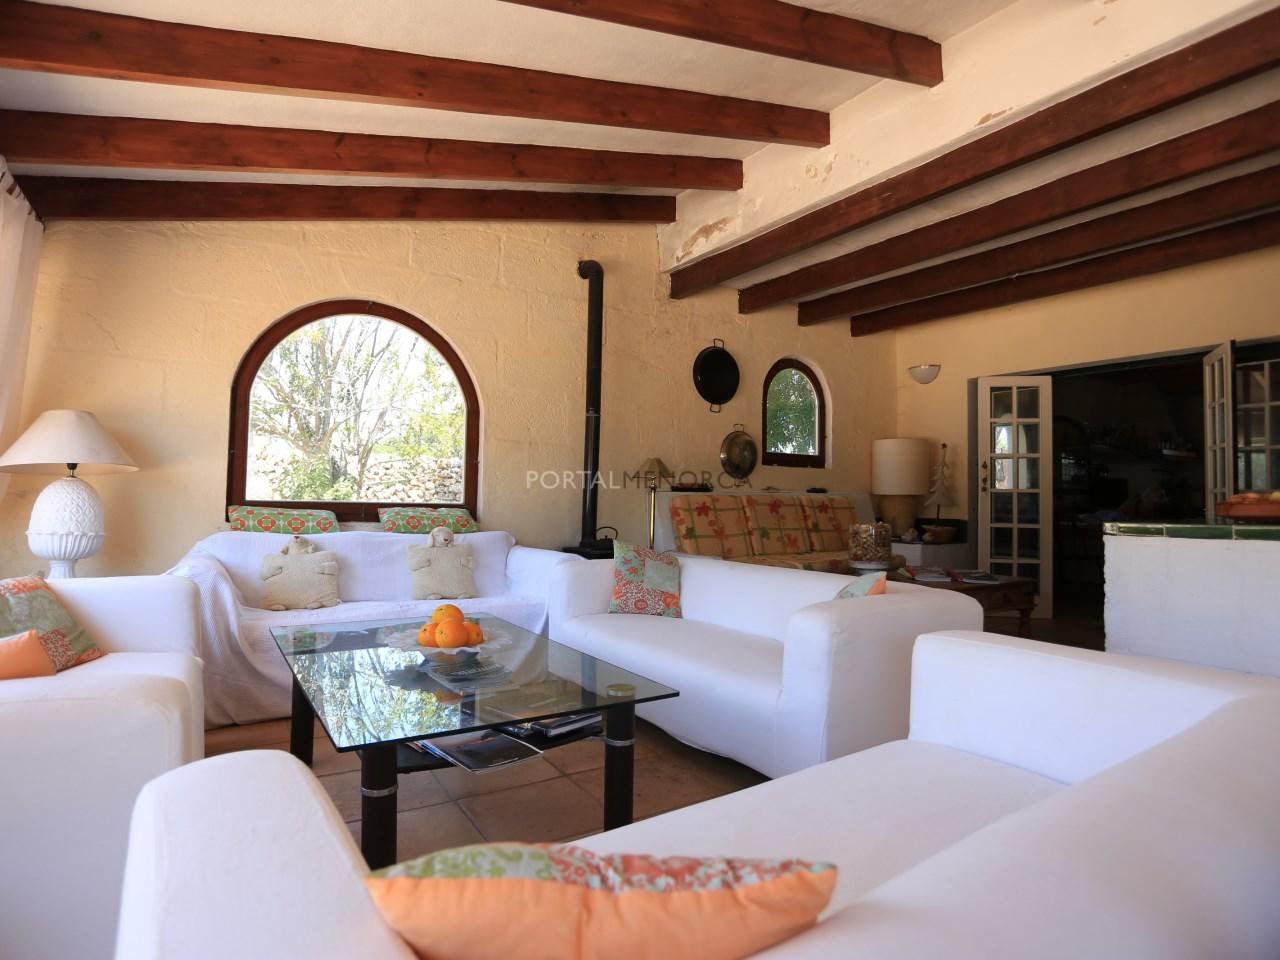 Our Terrace Lounge area